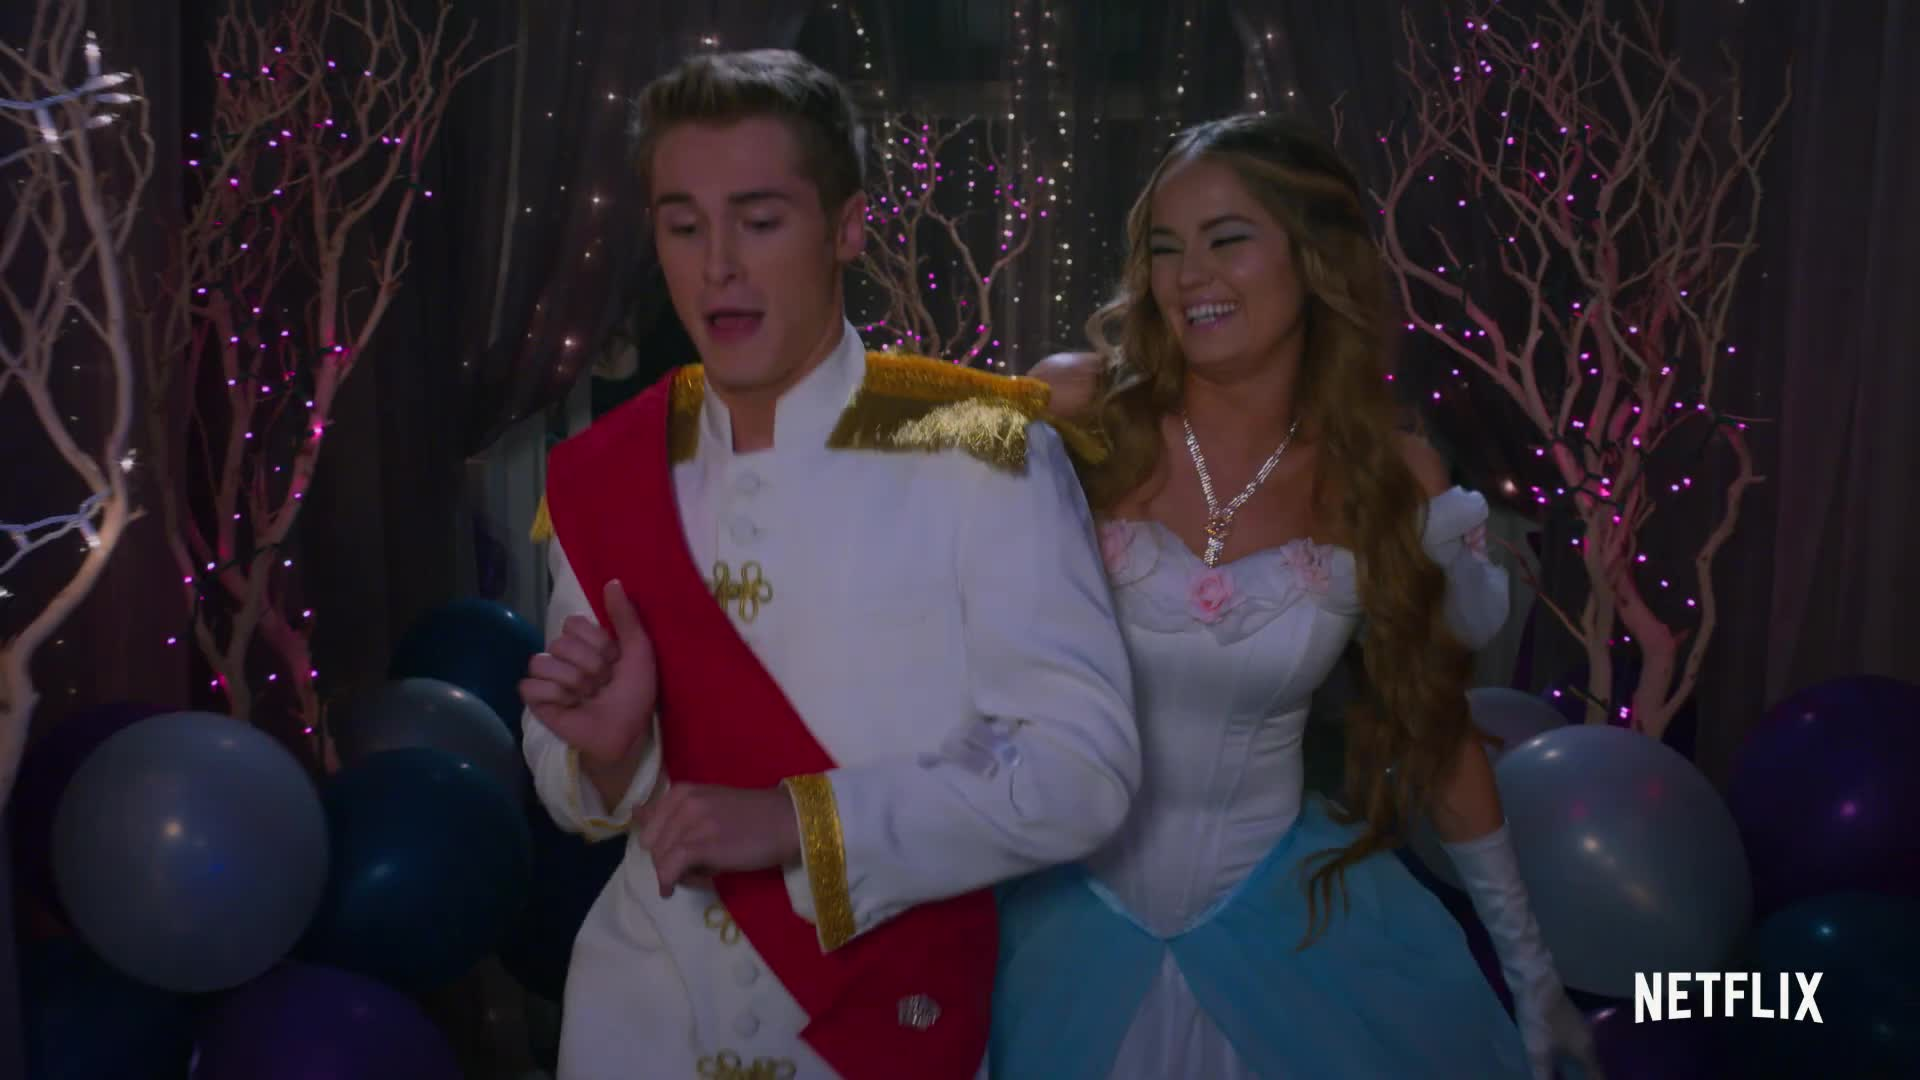 Insatiable Season 2 - Official Trailer - Netflix screen capture